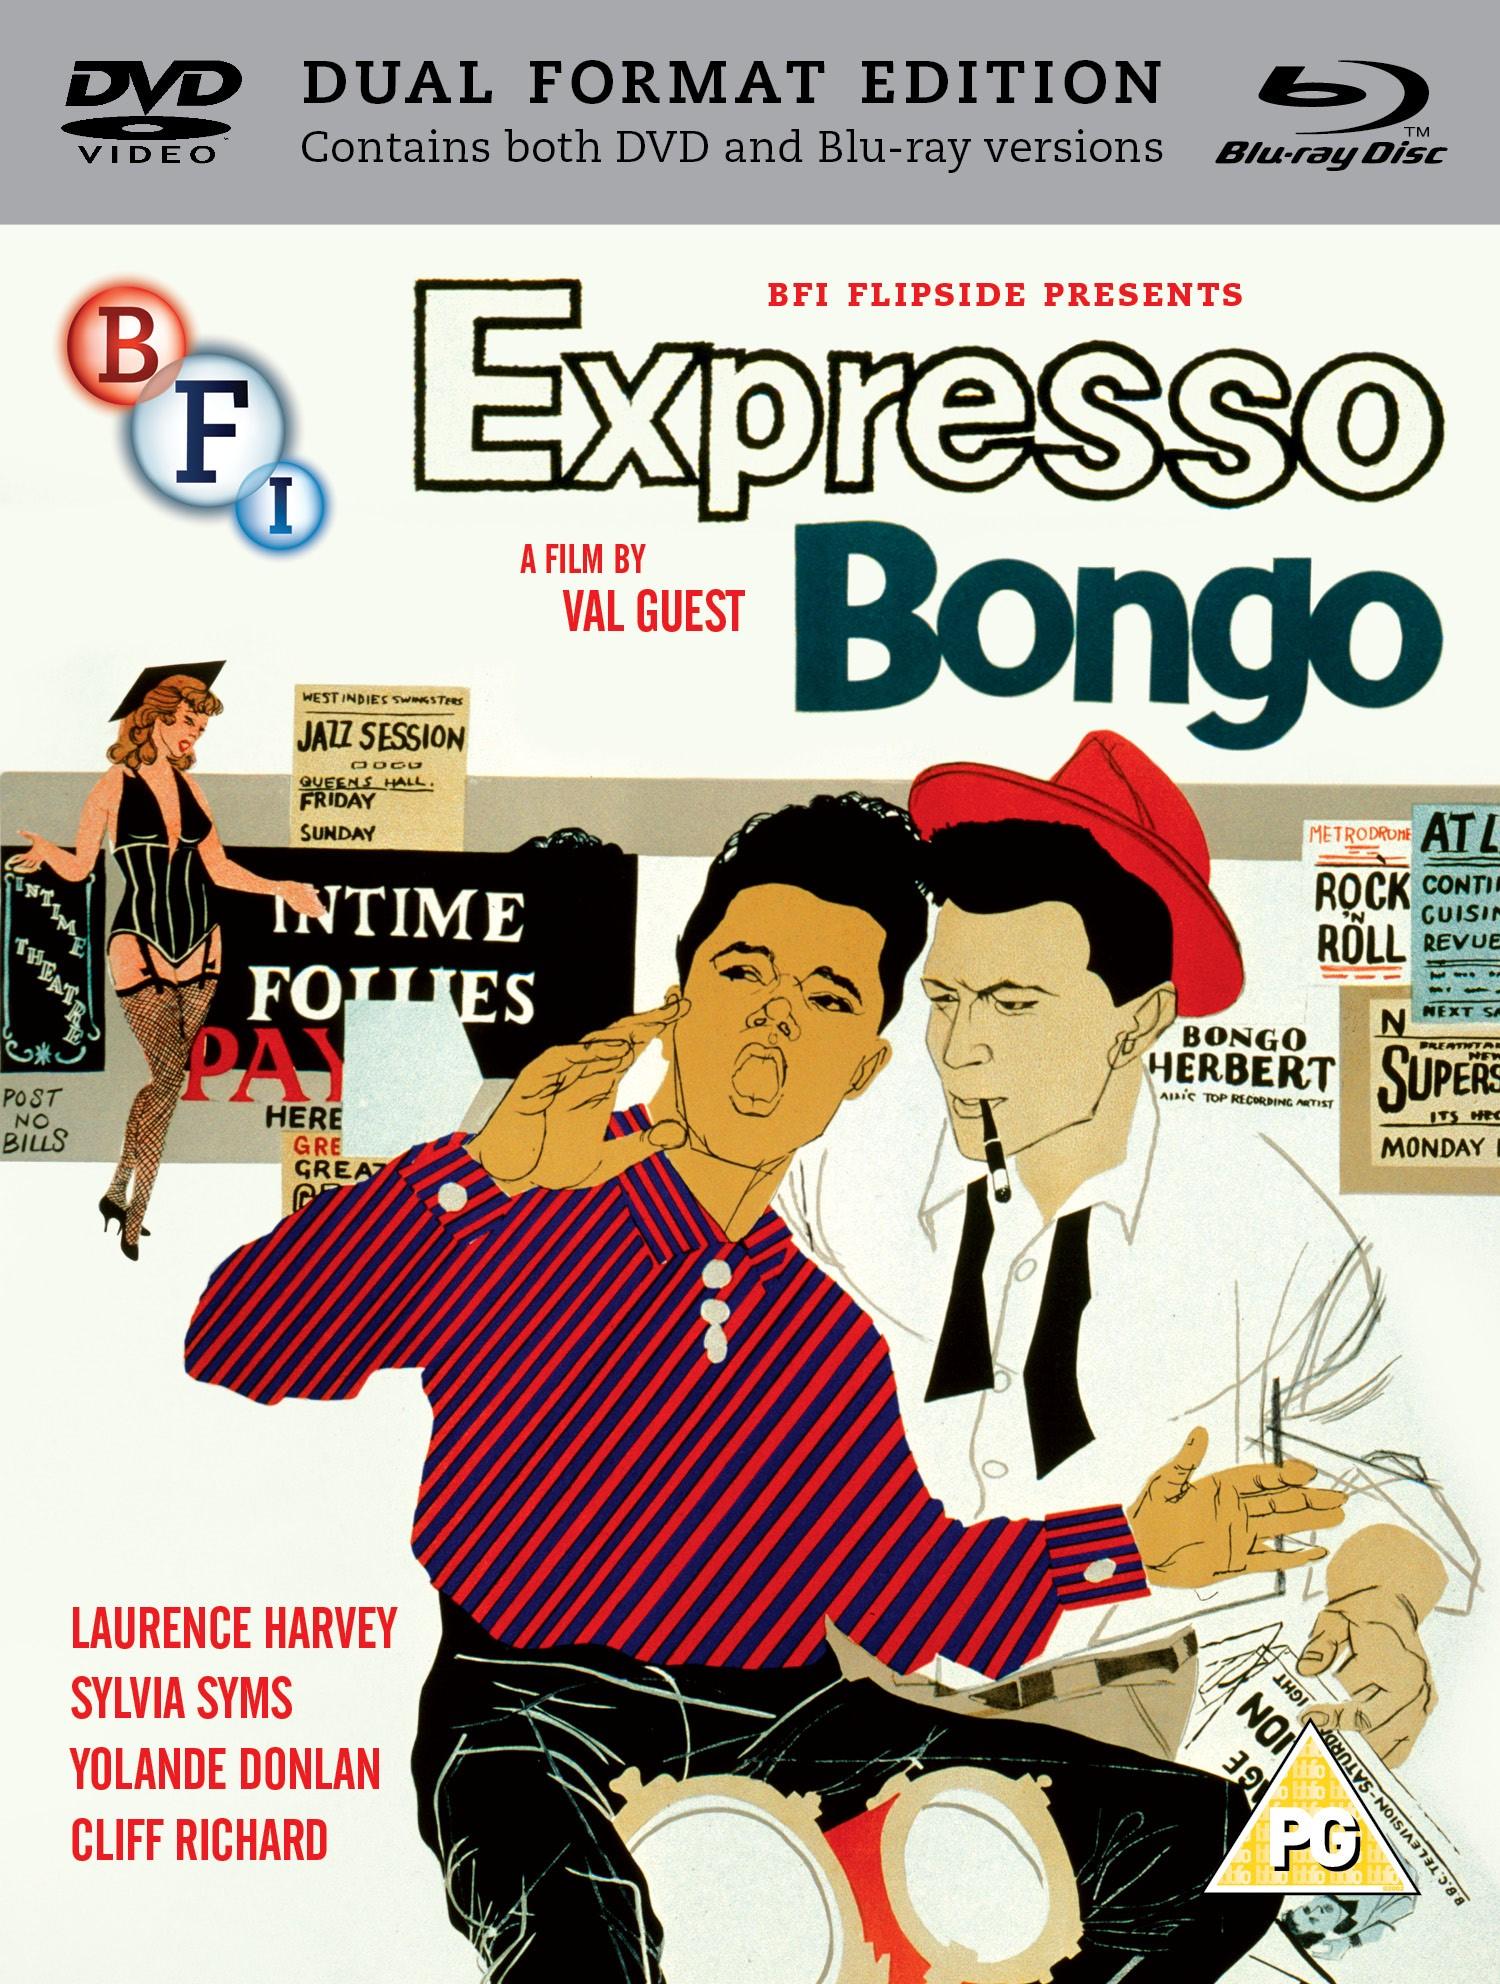 Buy Expresso Bongo (Flipside 031)  (Dual Format)